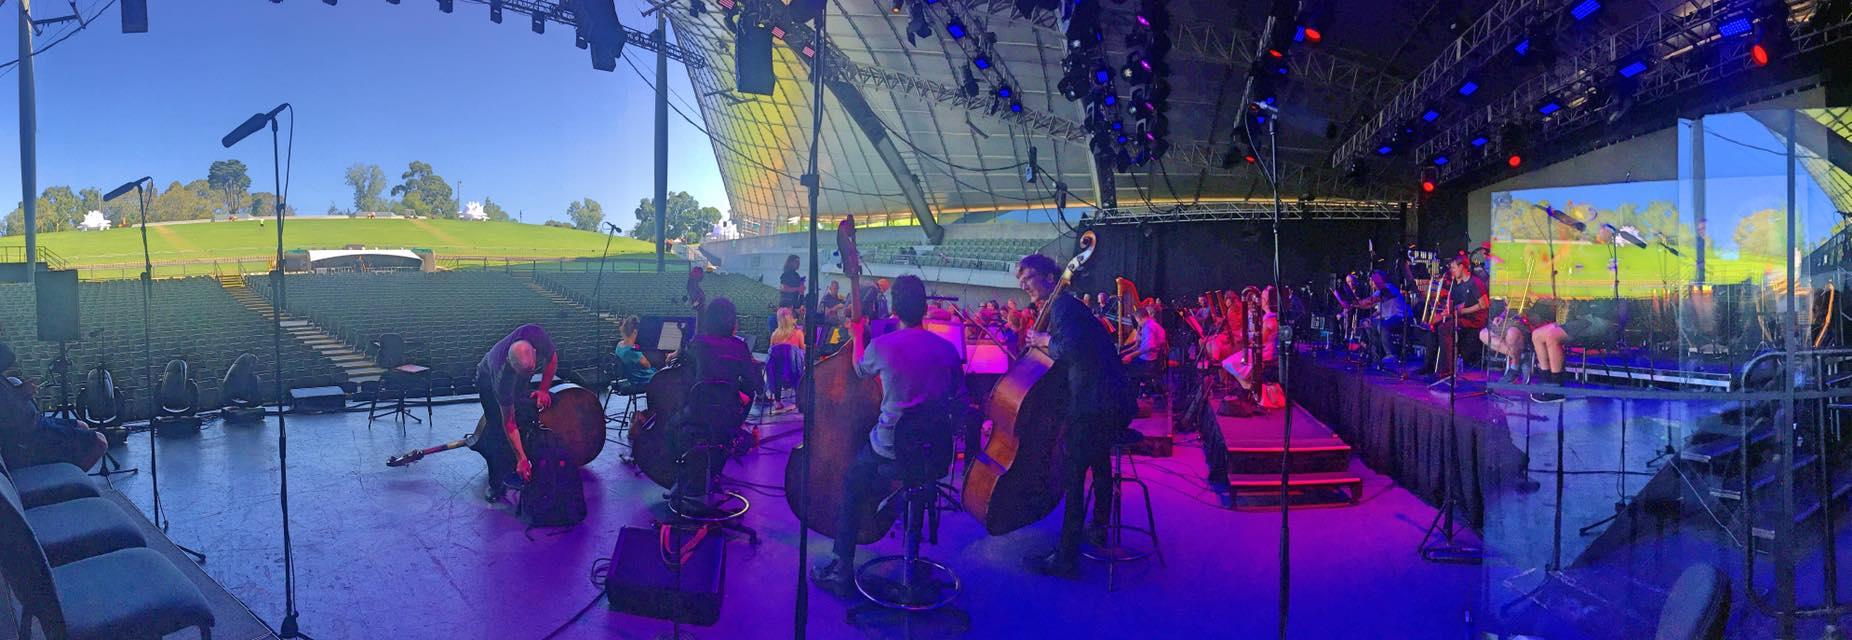 The Music of AR Rahman, Sydney Myer Music Bowl